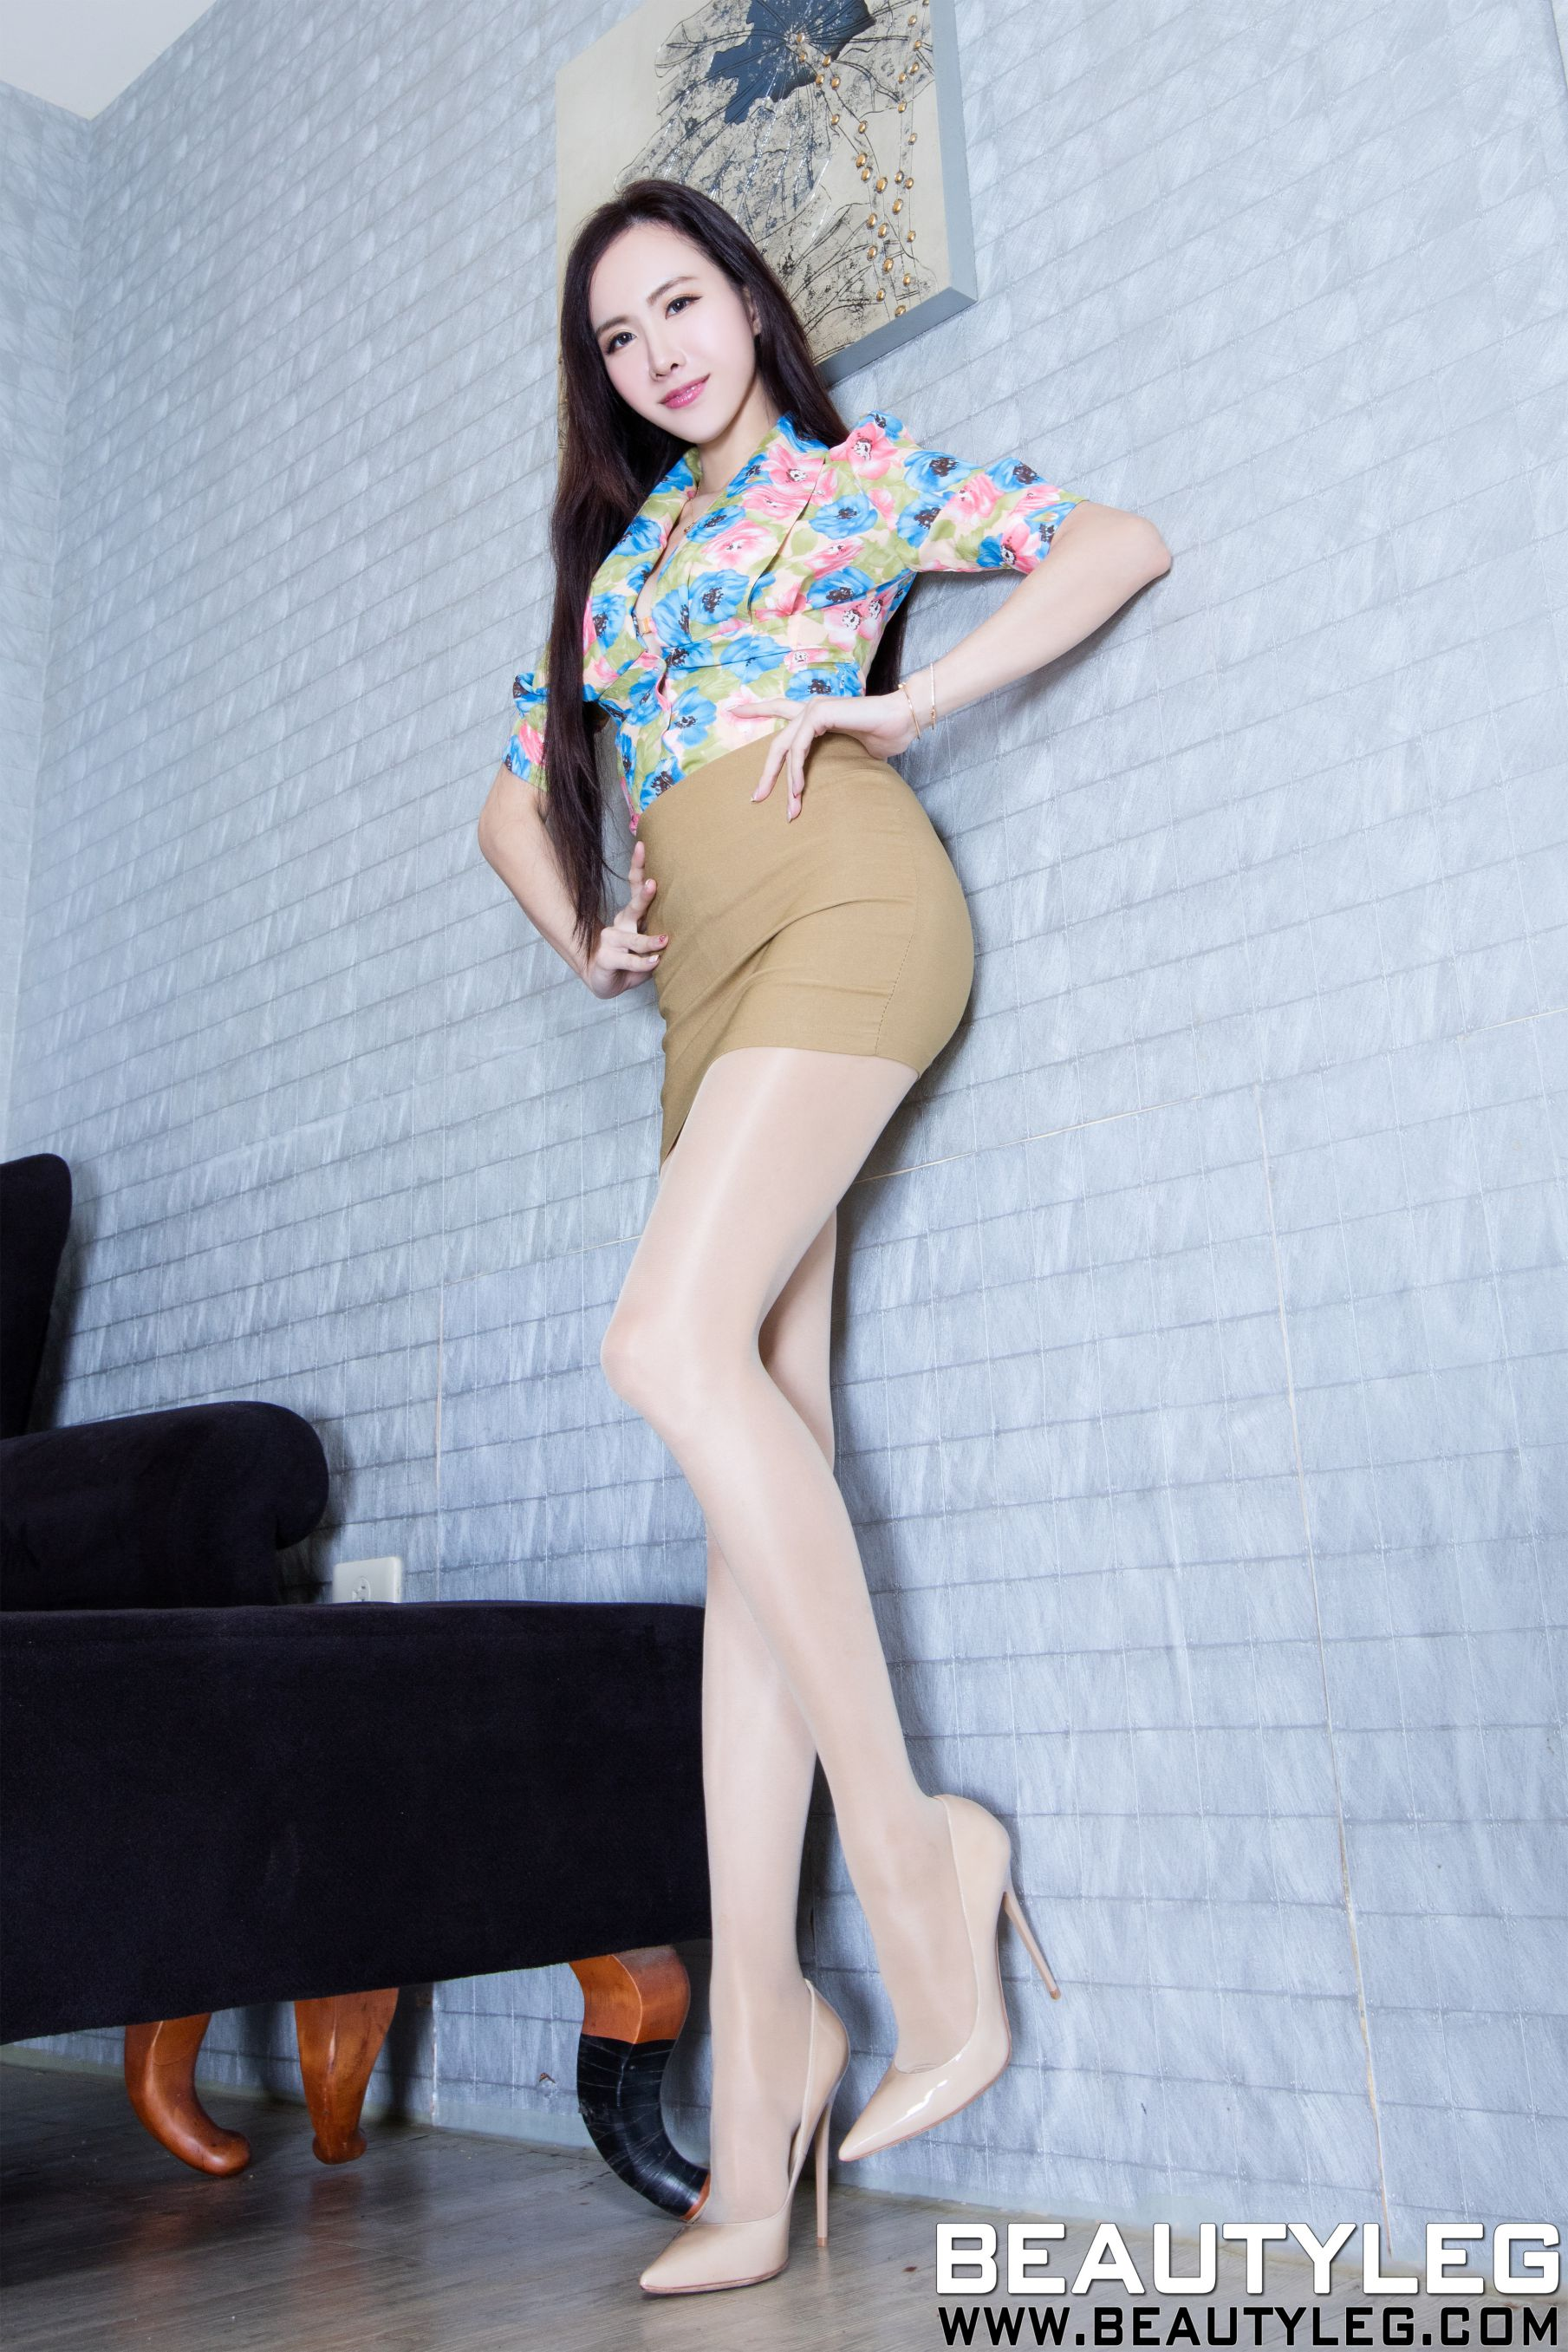 VOL.1872 [Beautyleg]肉丝袜高跟美腿:曾妍希(腿模Dora)高品质写真套图(42P)